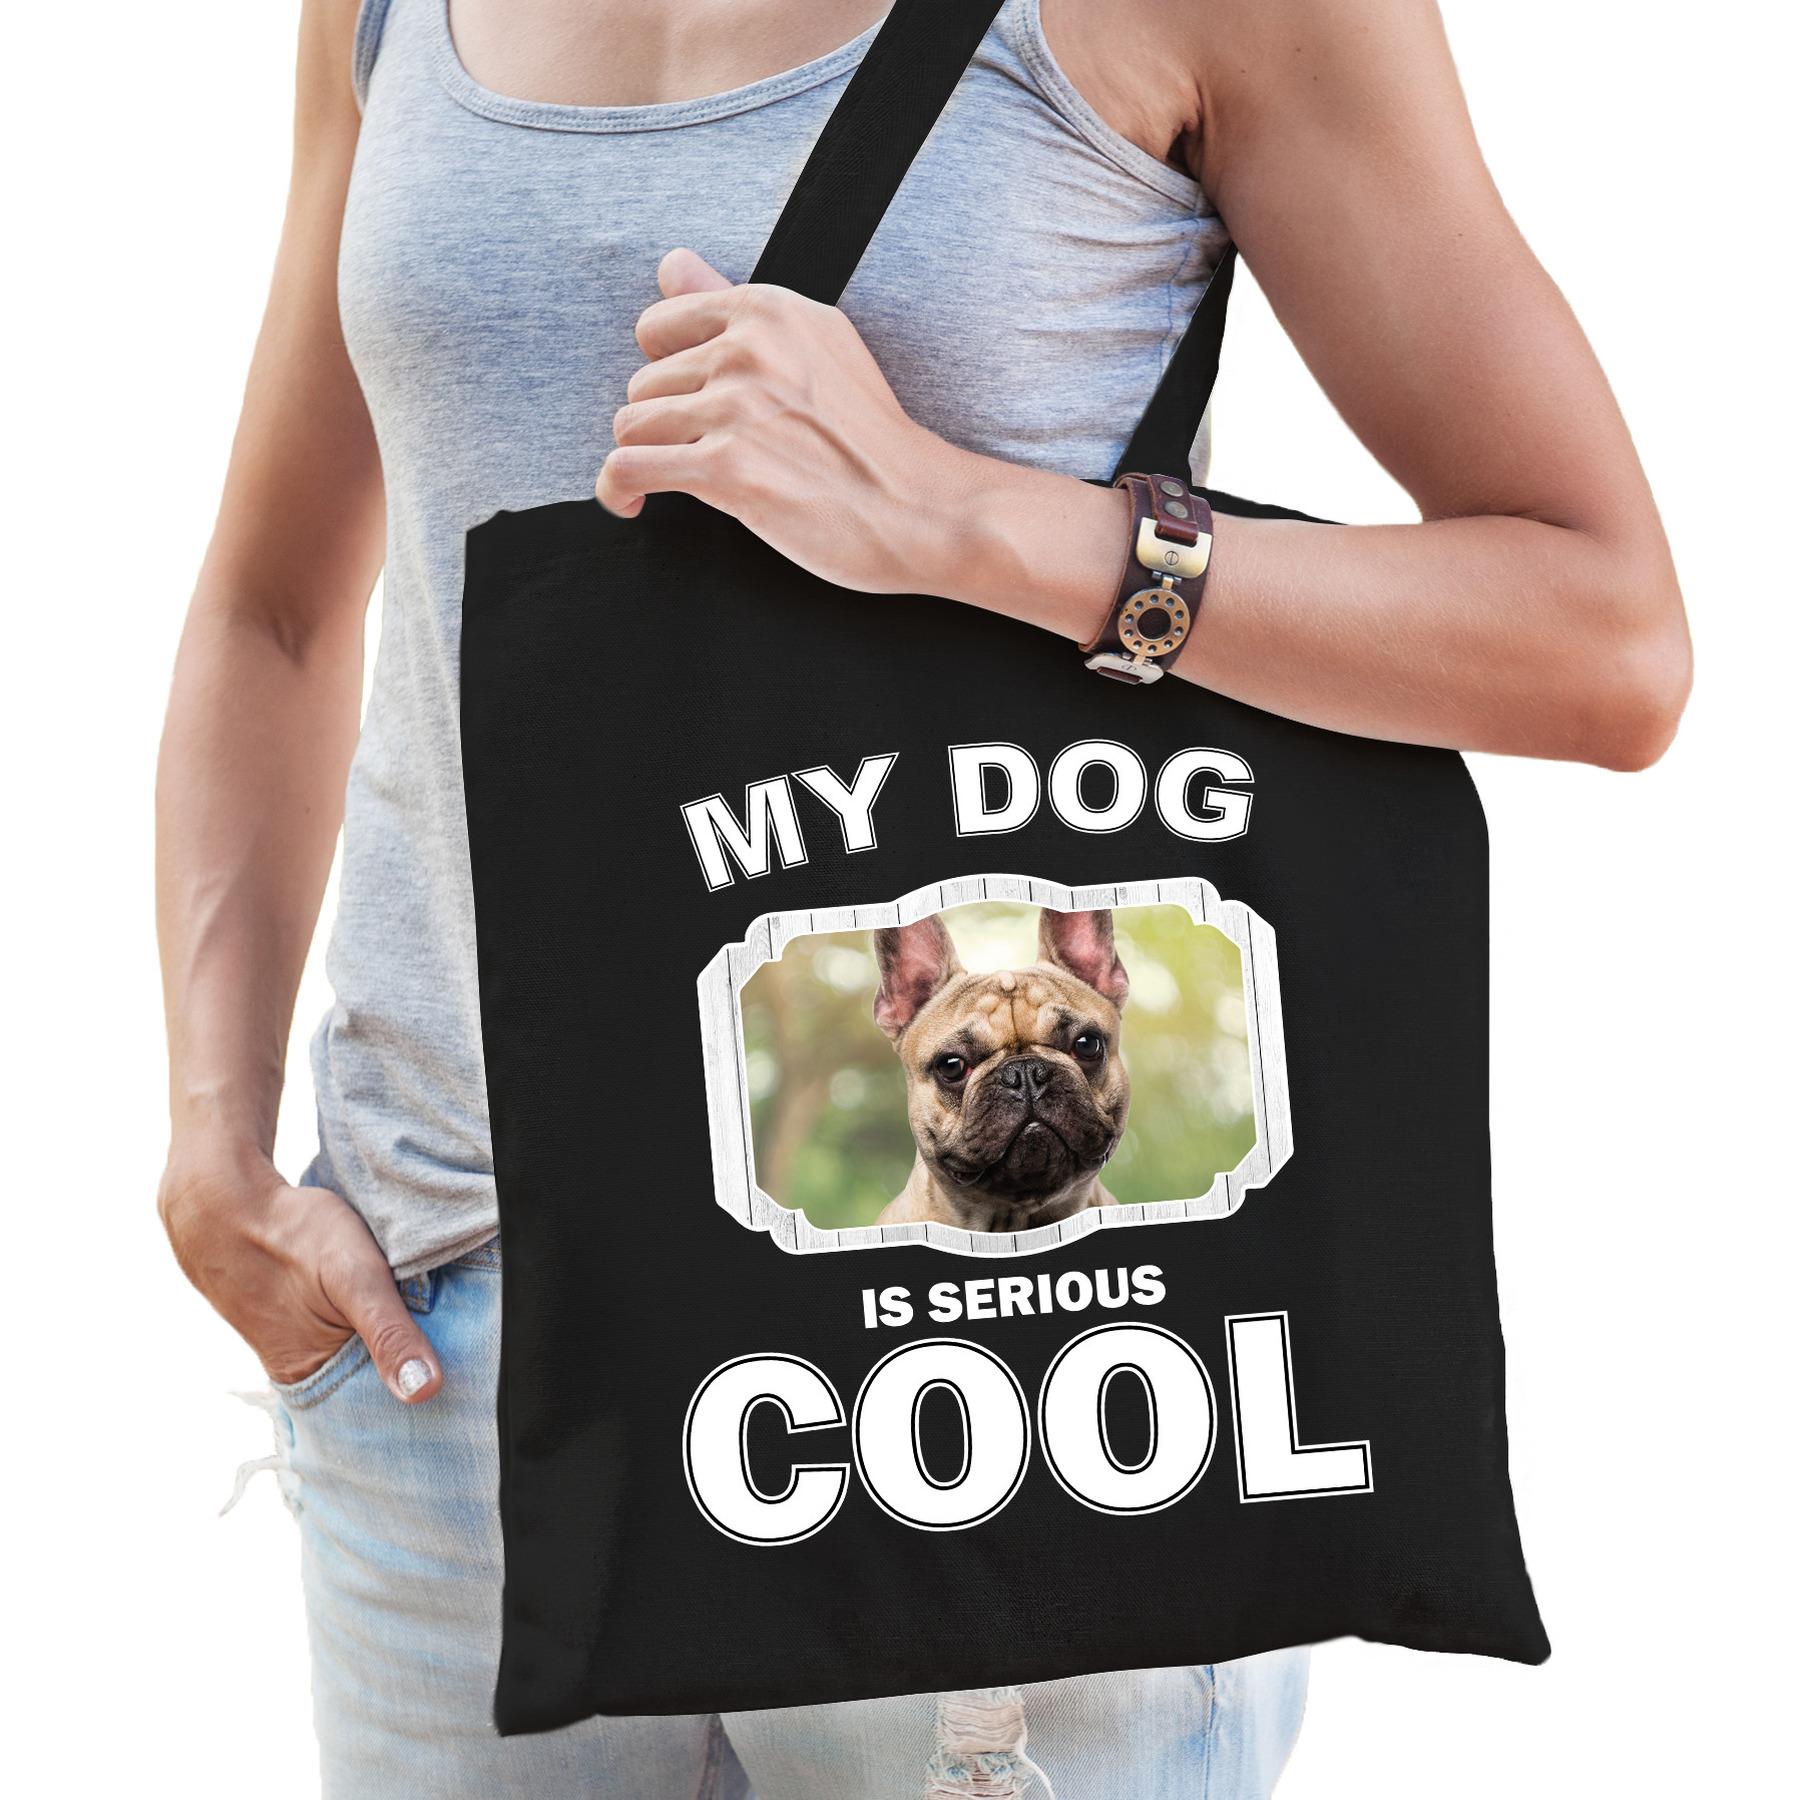 Katoenen tasje my dog is serious cool zwart - Franse bulldog honden cadeau tas